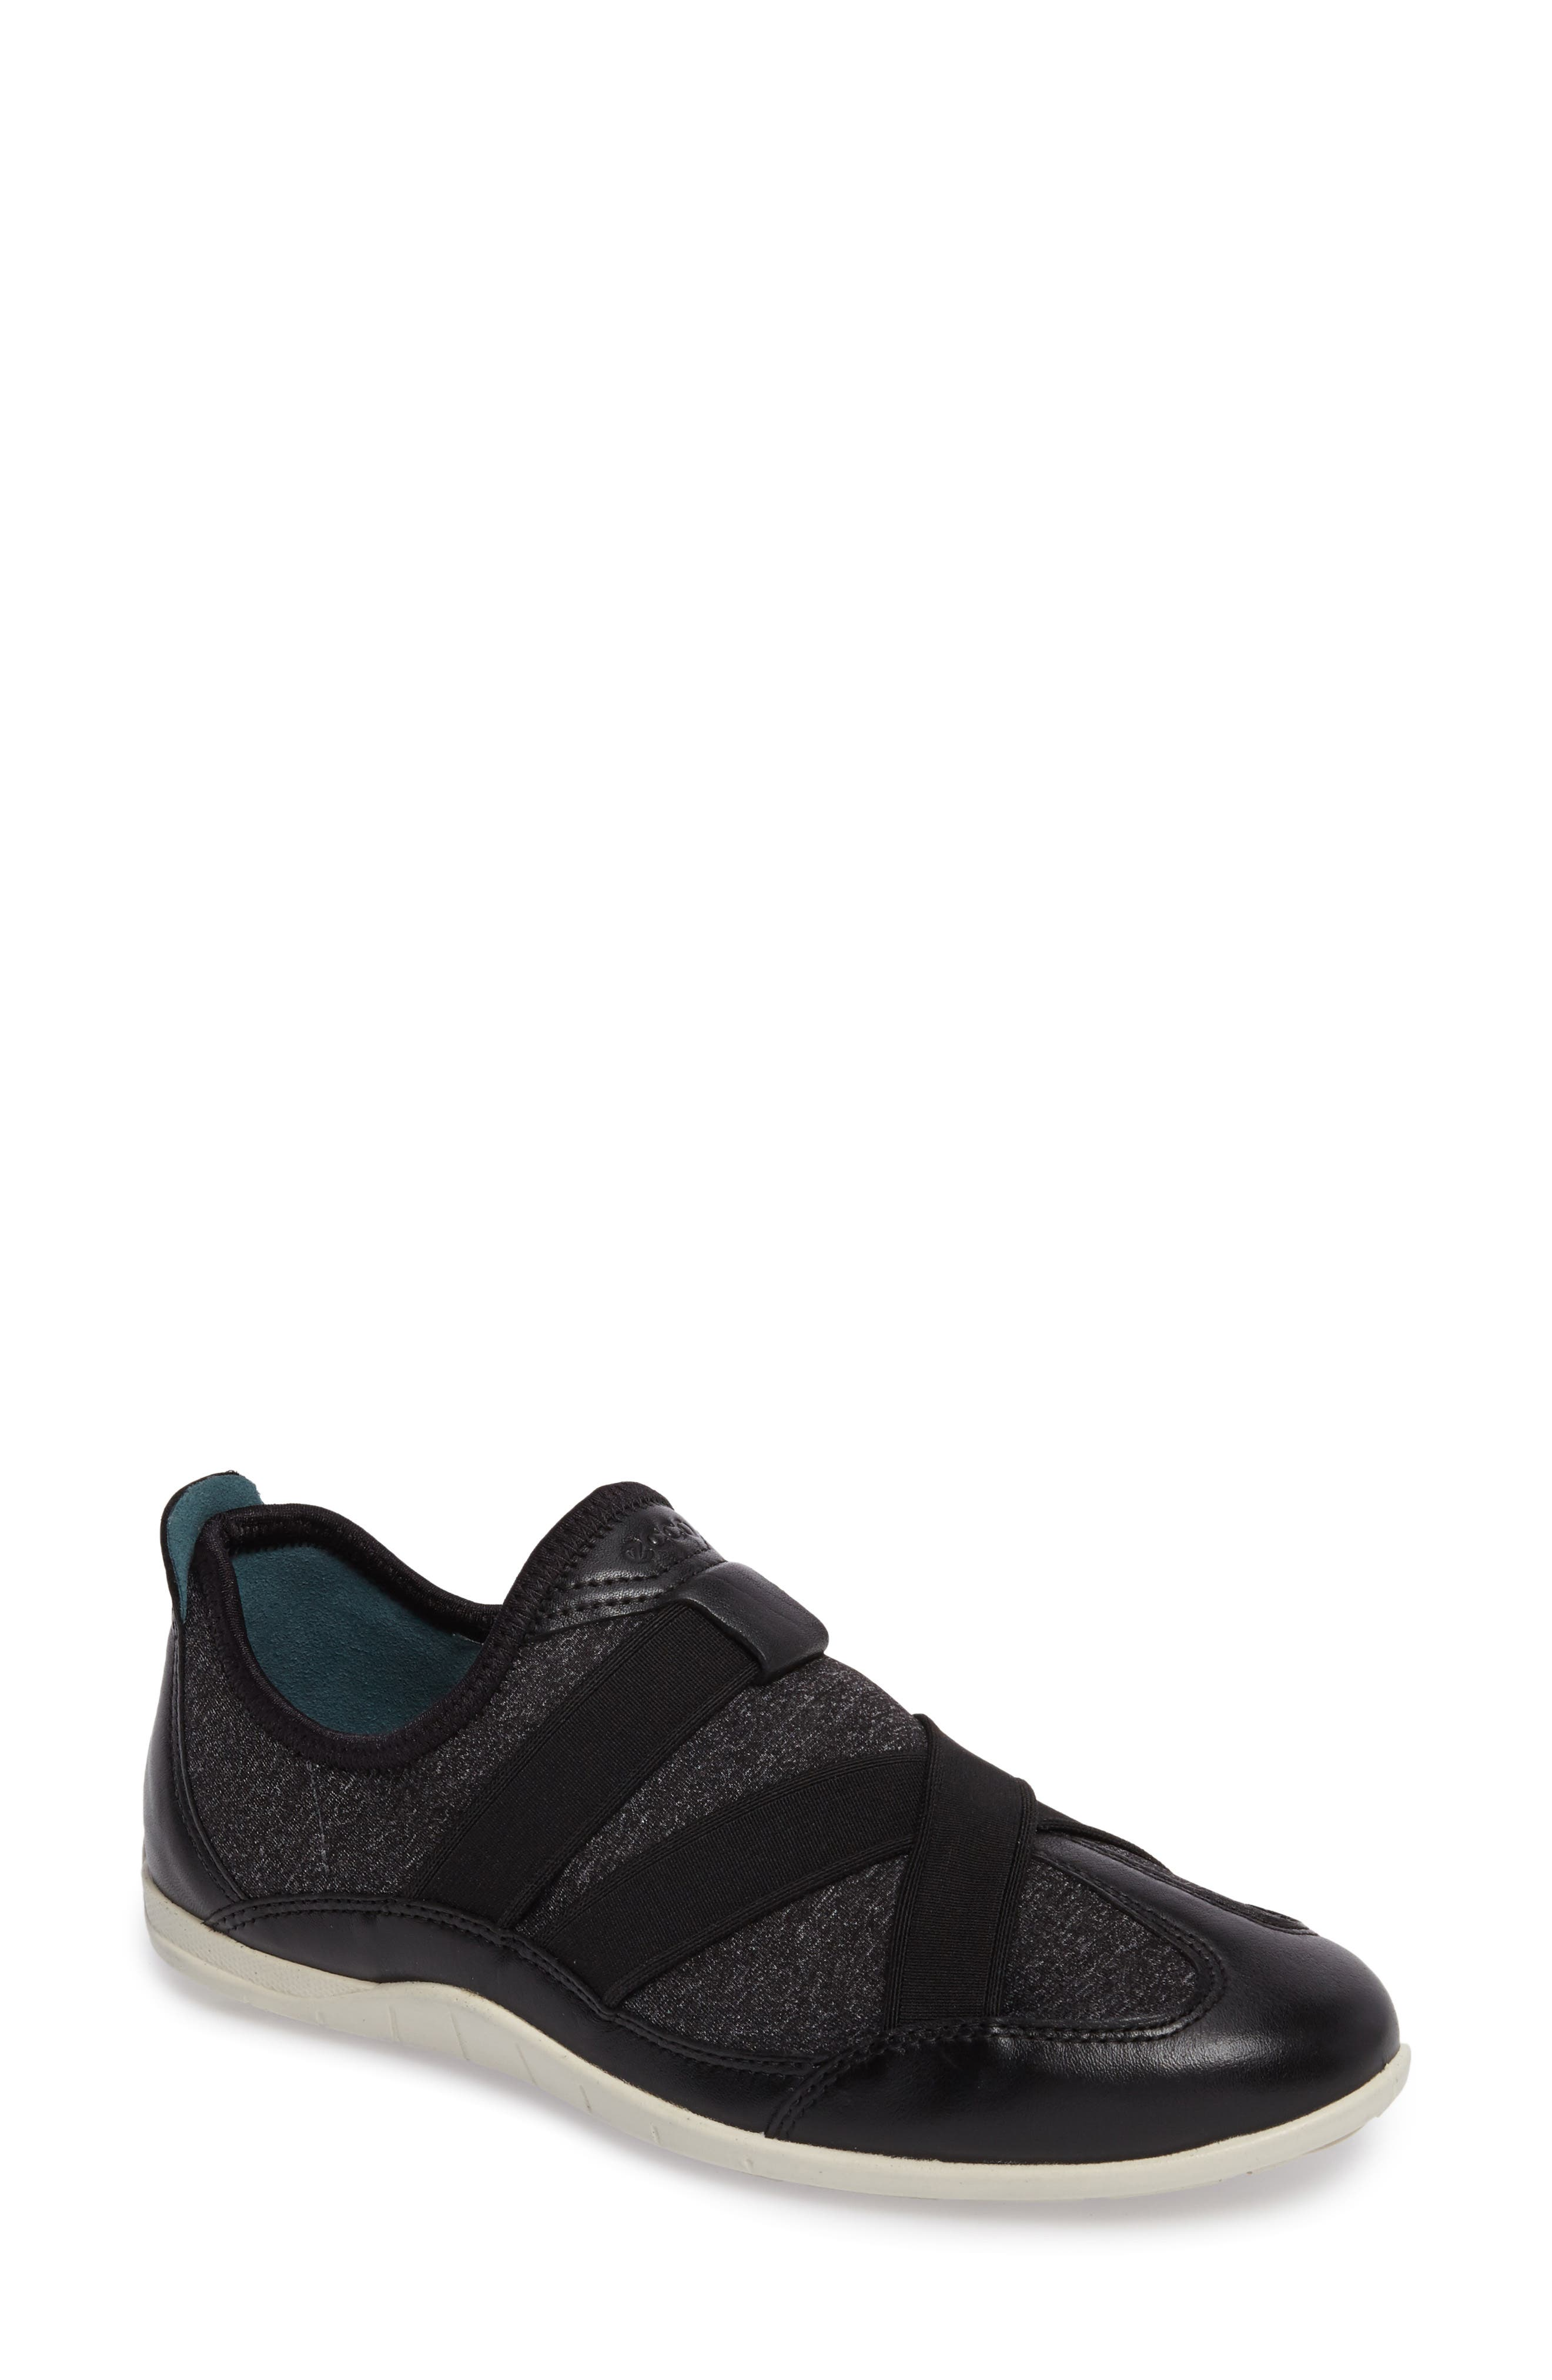 'Bluma' Sneaker,                         Main,                         color, Black Leather